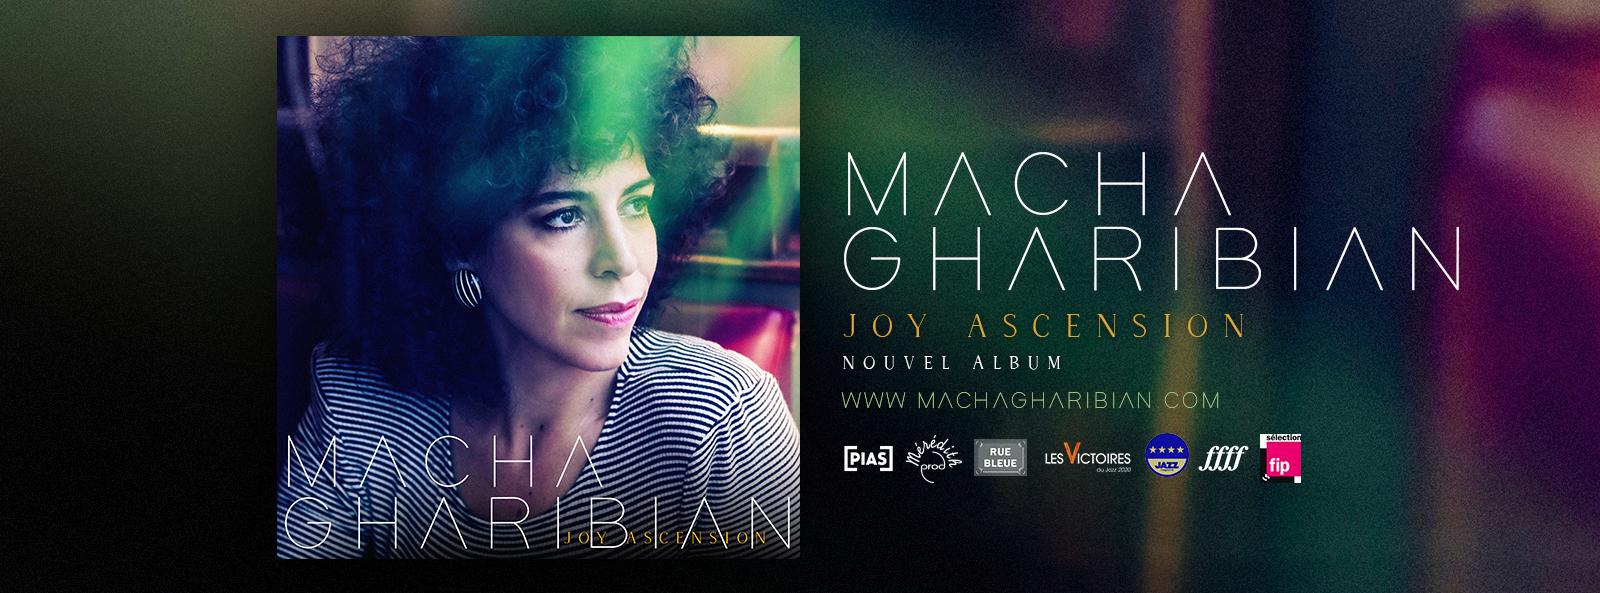 macha gharibian - Joy ascencion- ban FB new (1)